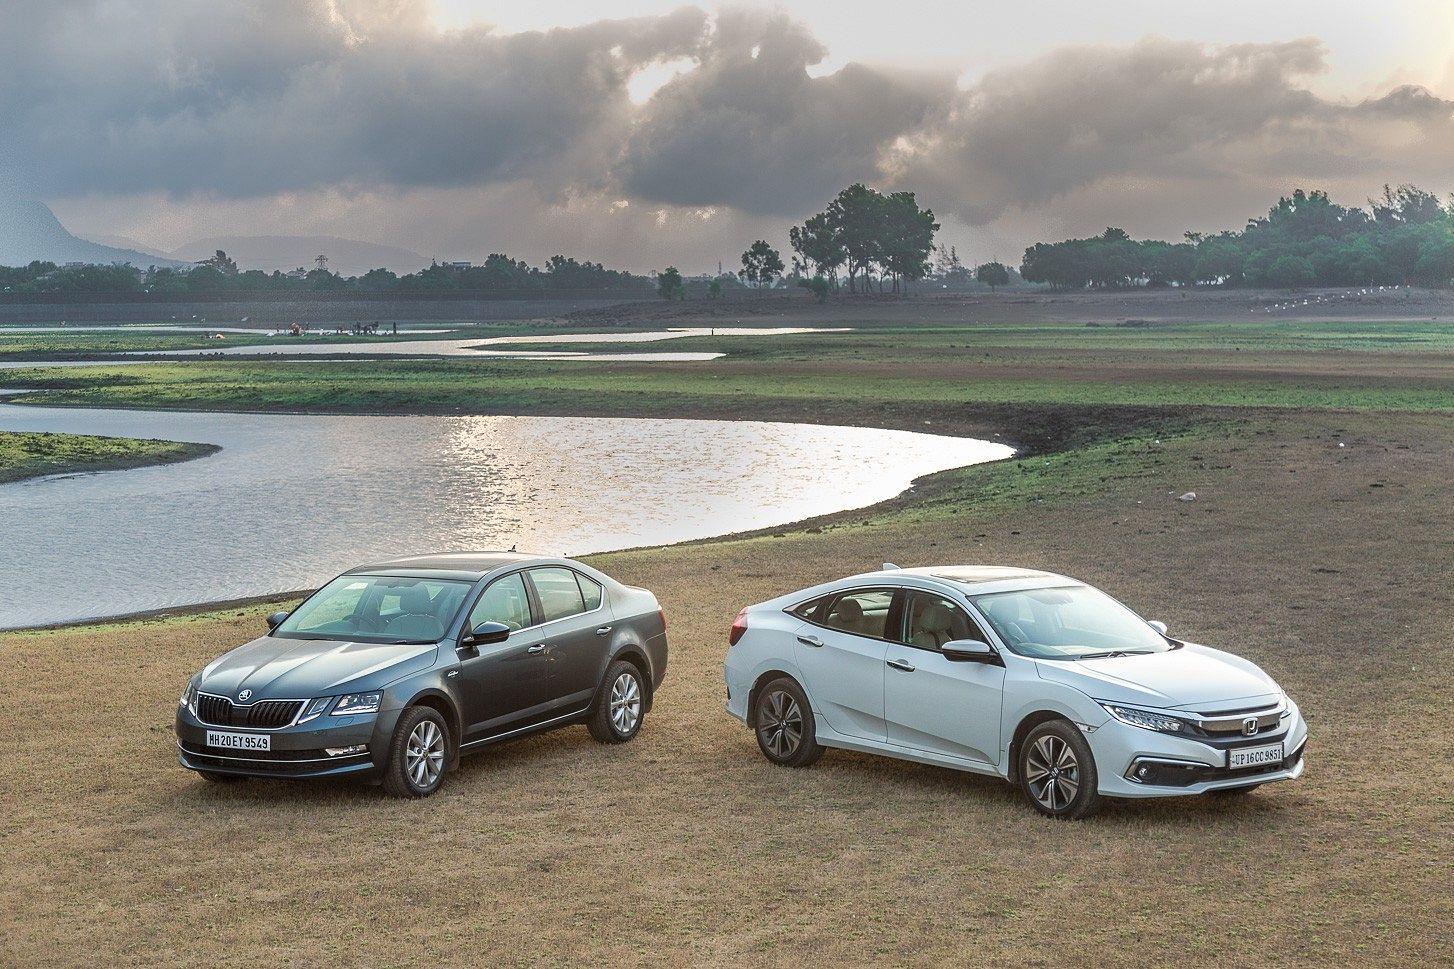 Honda Civic vs Skoda Octavia: Petrol Comparison Review